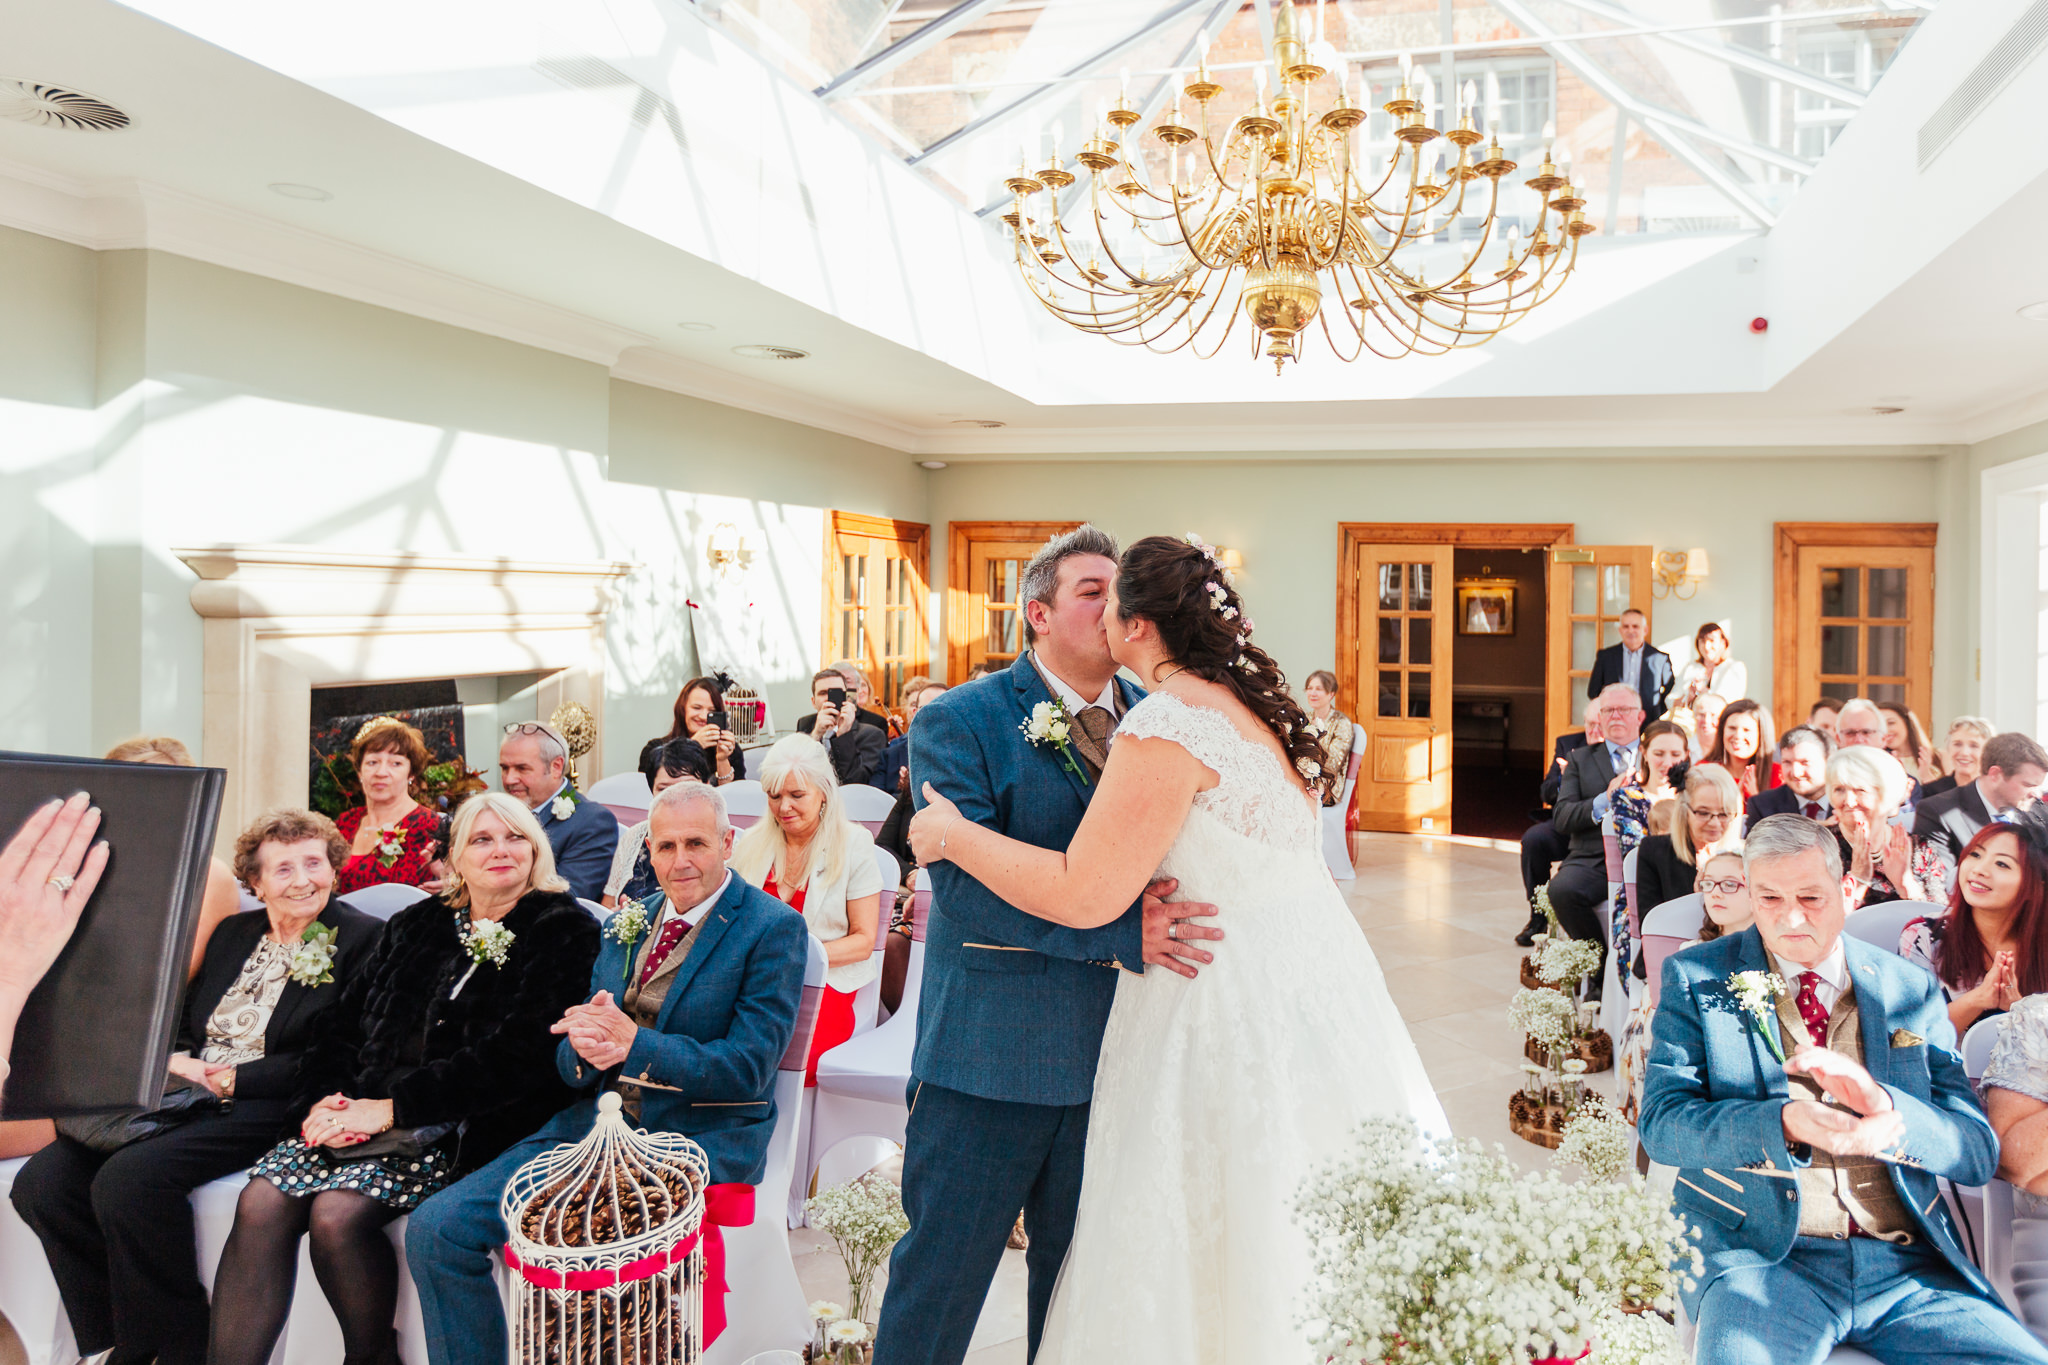 Willington-Hall-Cheshire-Wedding-21.jpg